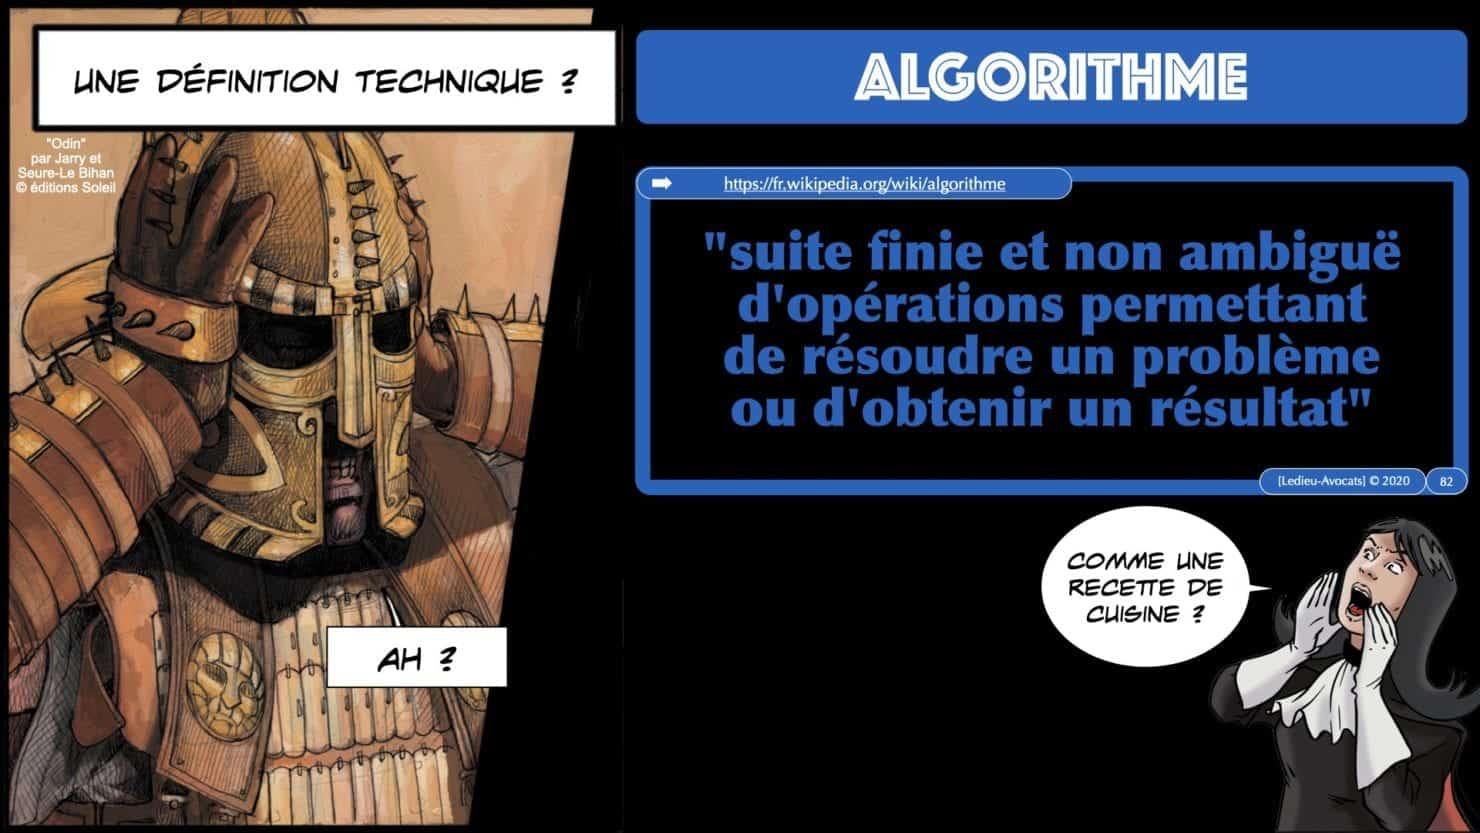 307 Intelligence artificielle-machine-learning-deep-learning-base de données-BIG-DATA *16:9* Constellation ©Ledieu-Avocat-13-10-2020.082